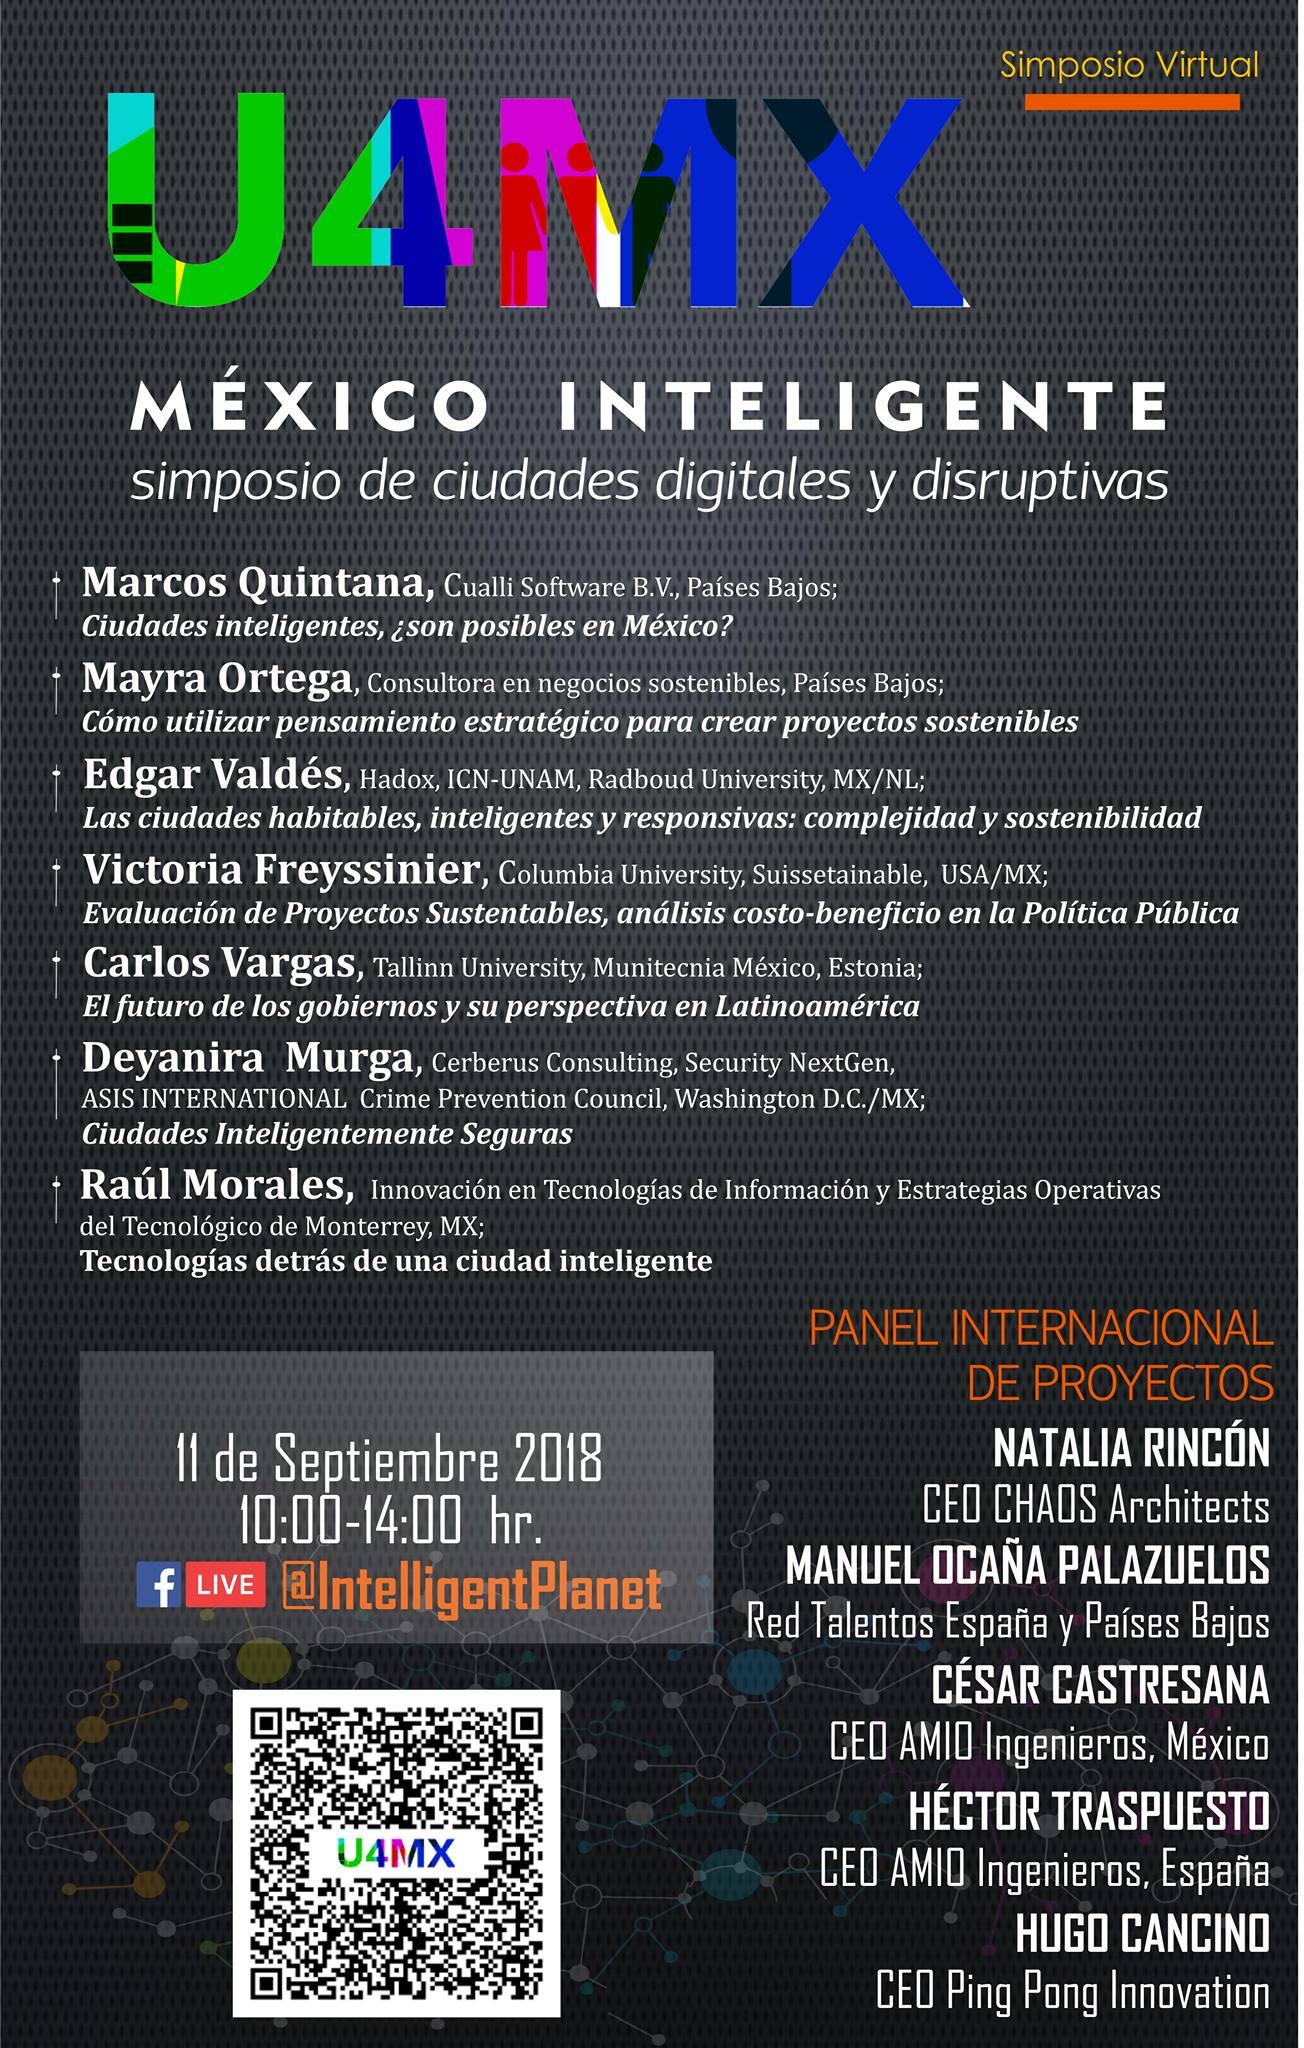 programa Simposio Virtual México Inteligente, amio ingenieros, leon municipio humano inteligente, guanajuato destino turístico inteligente